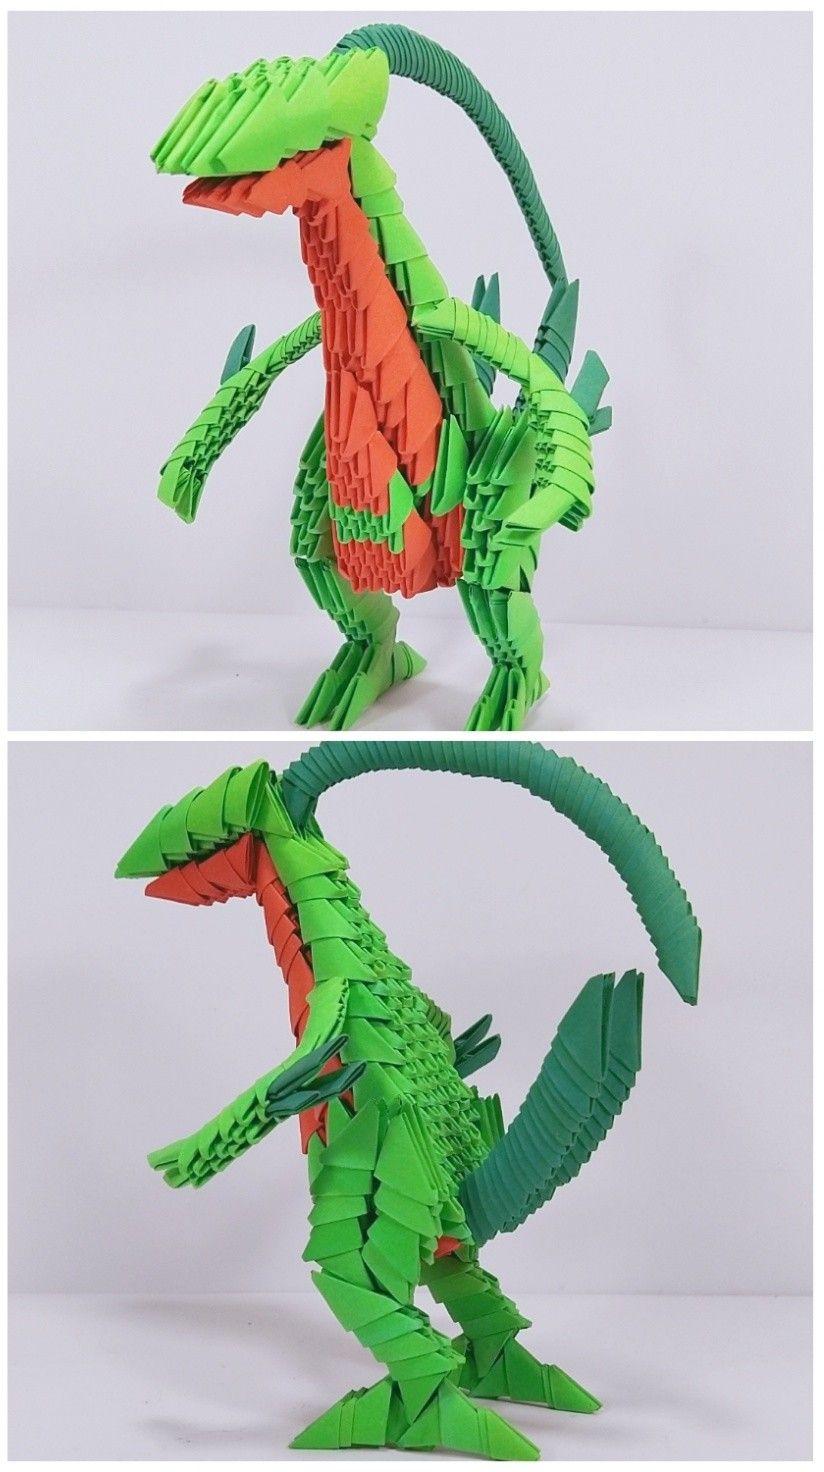 Photo of 3d origami Grovyli from pokemon